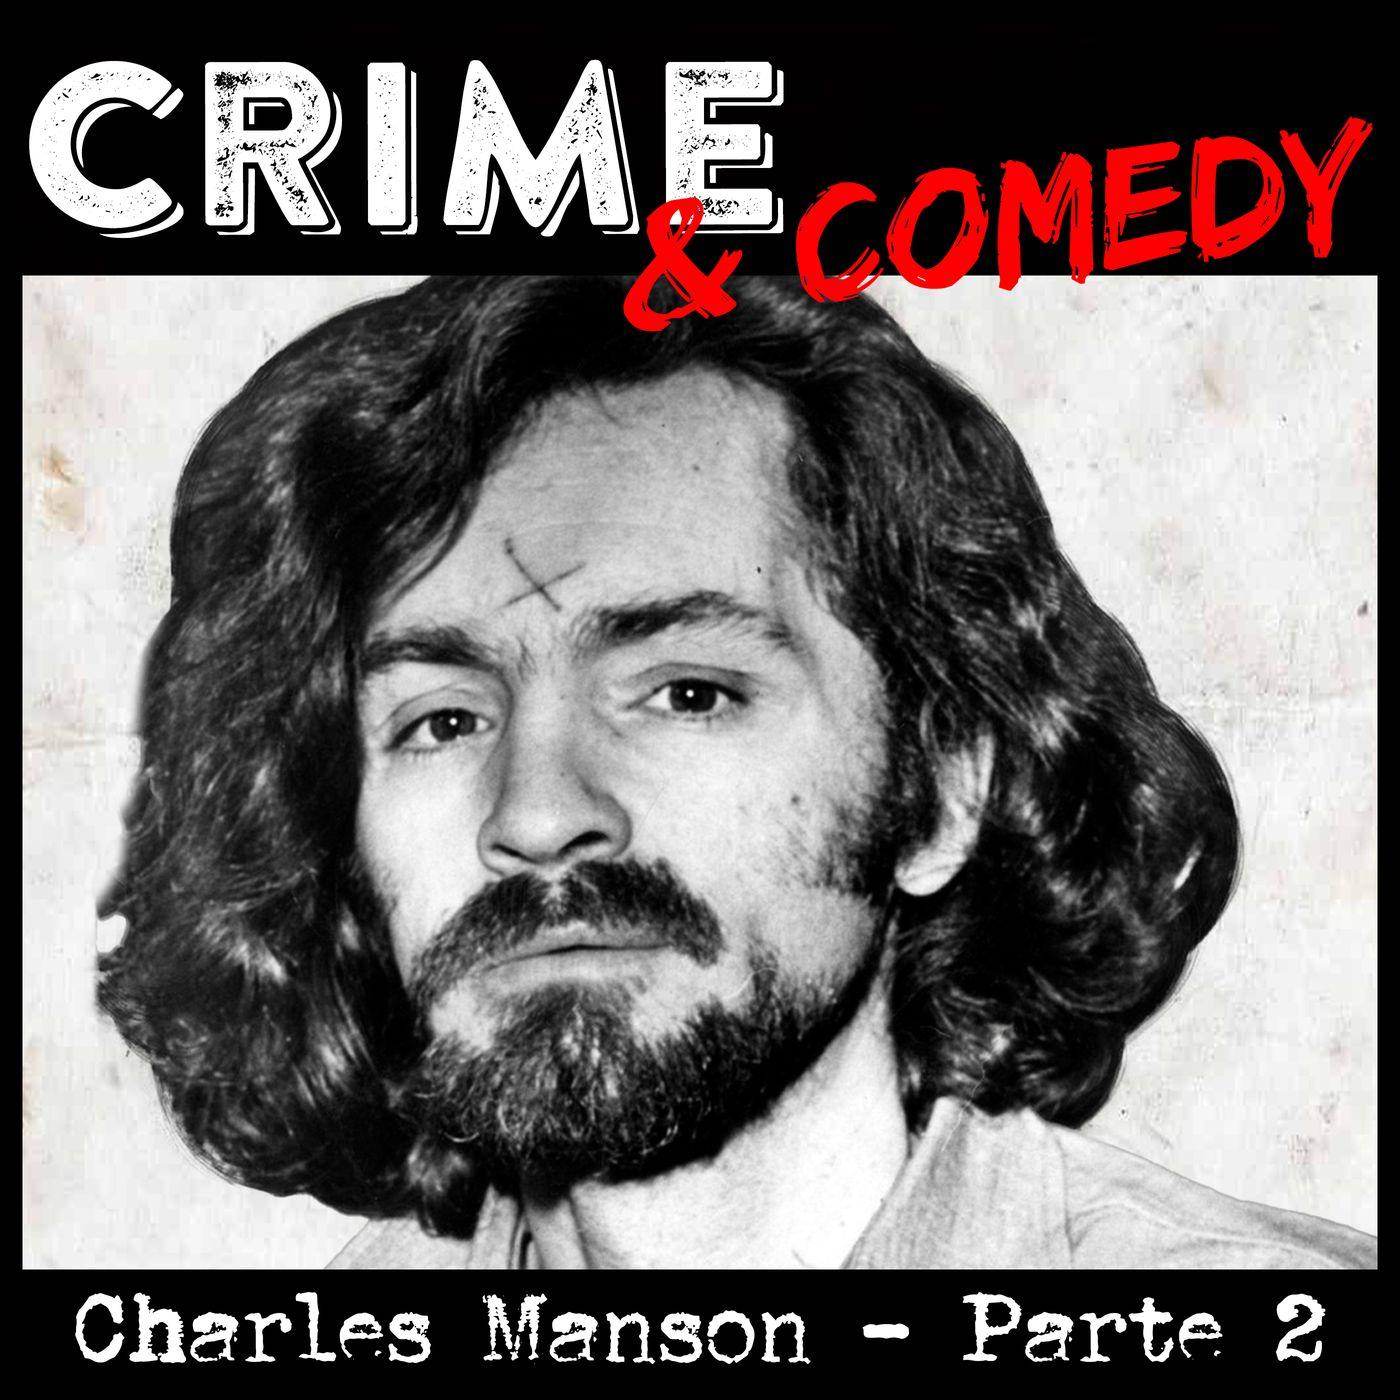 Charles Manson - Parte 2 - Le Stragi Tate - LaBianca - 32